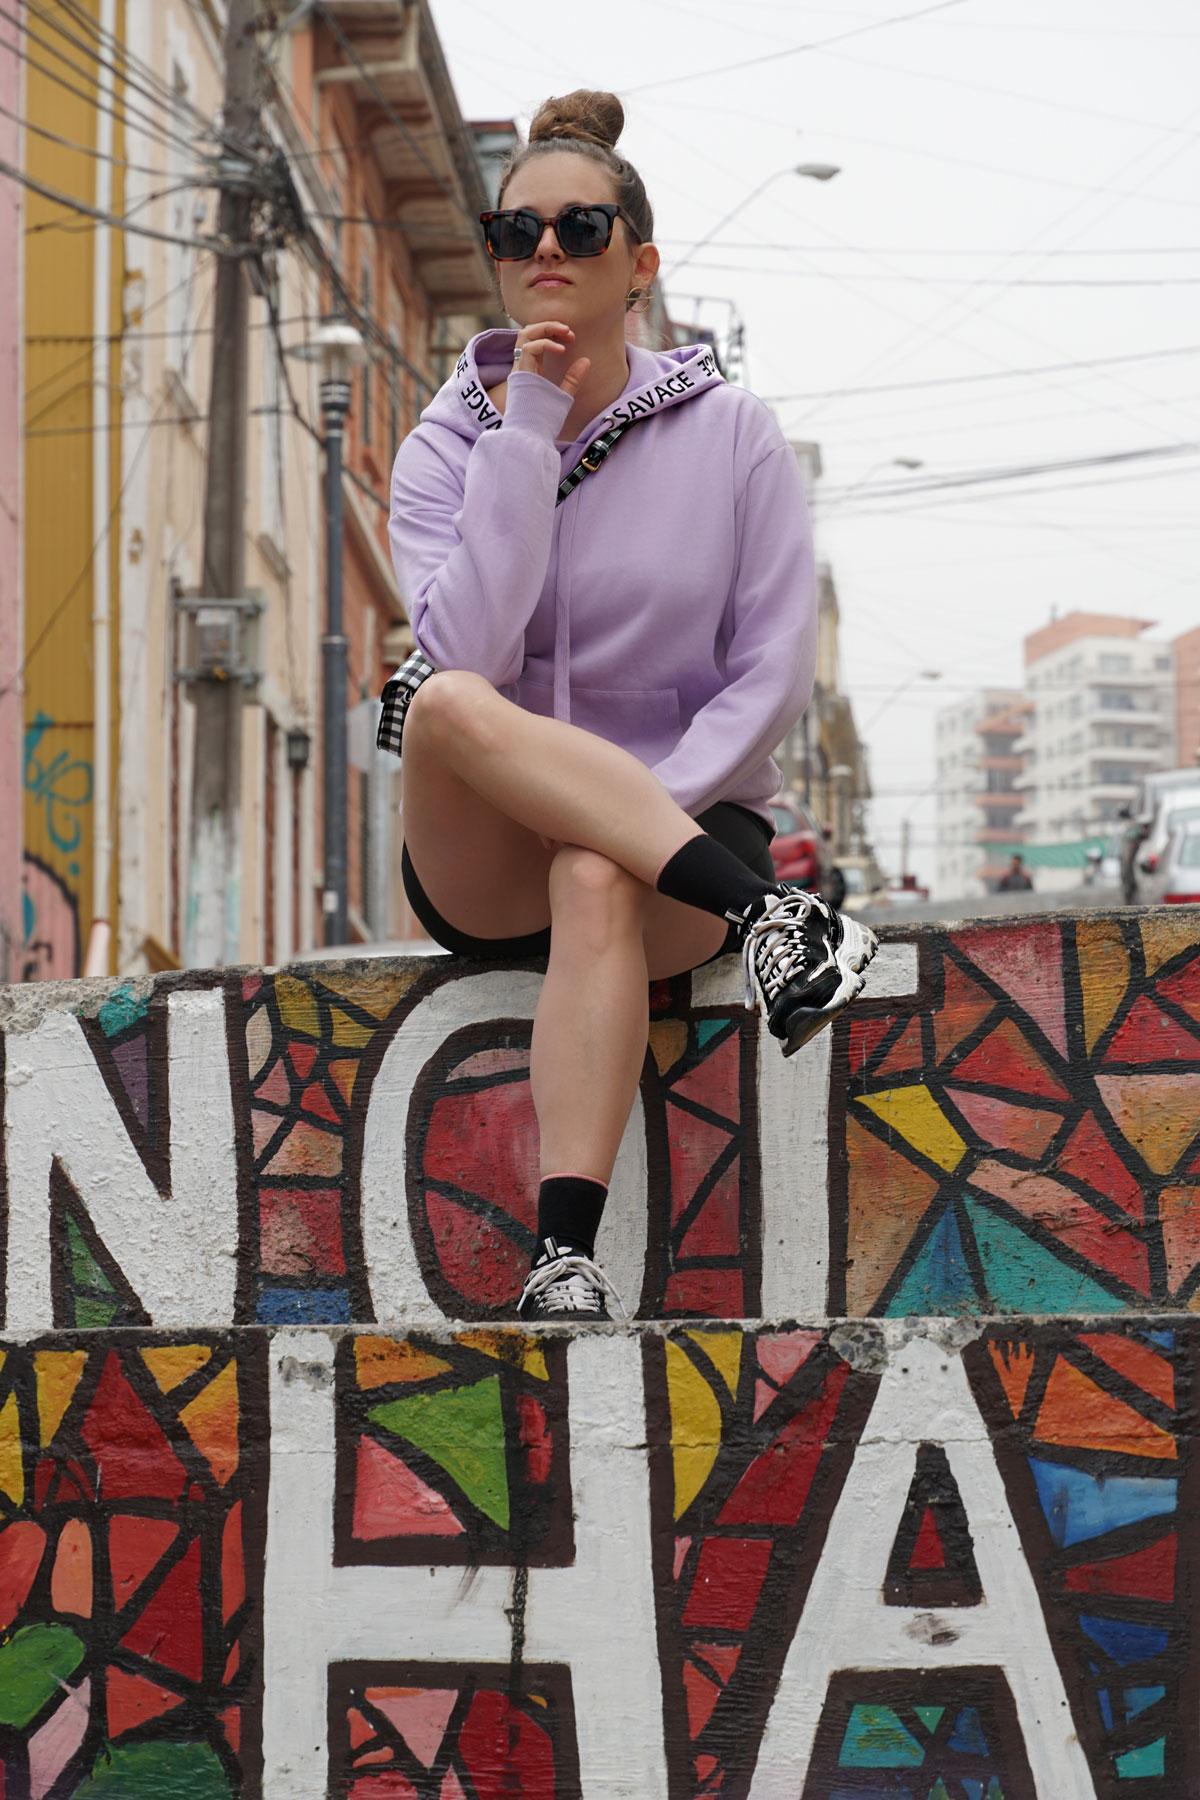 Trendfarbe Lila mit kurzen Leggings und Sneakers.